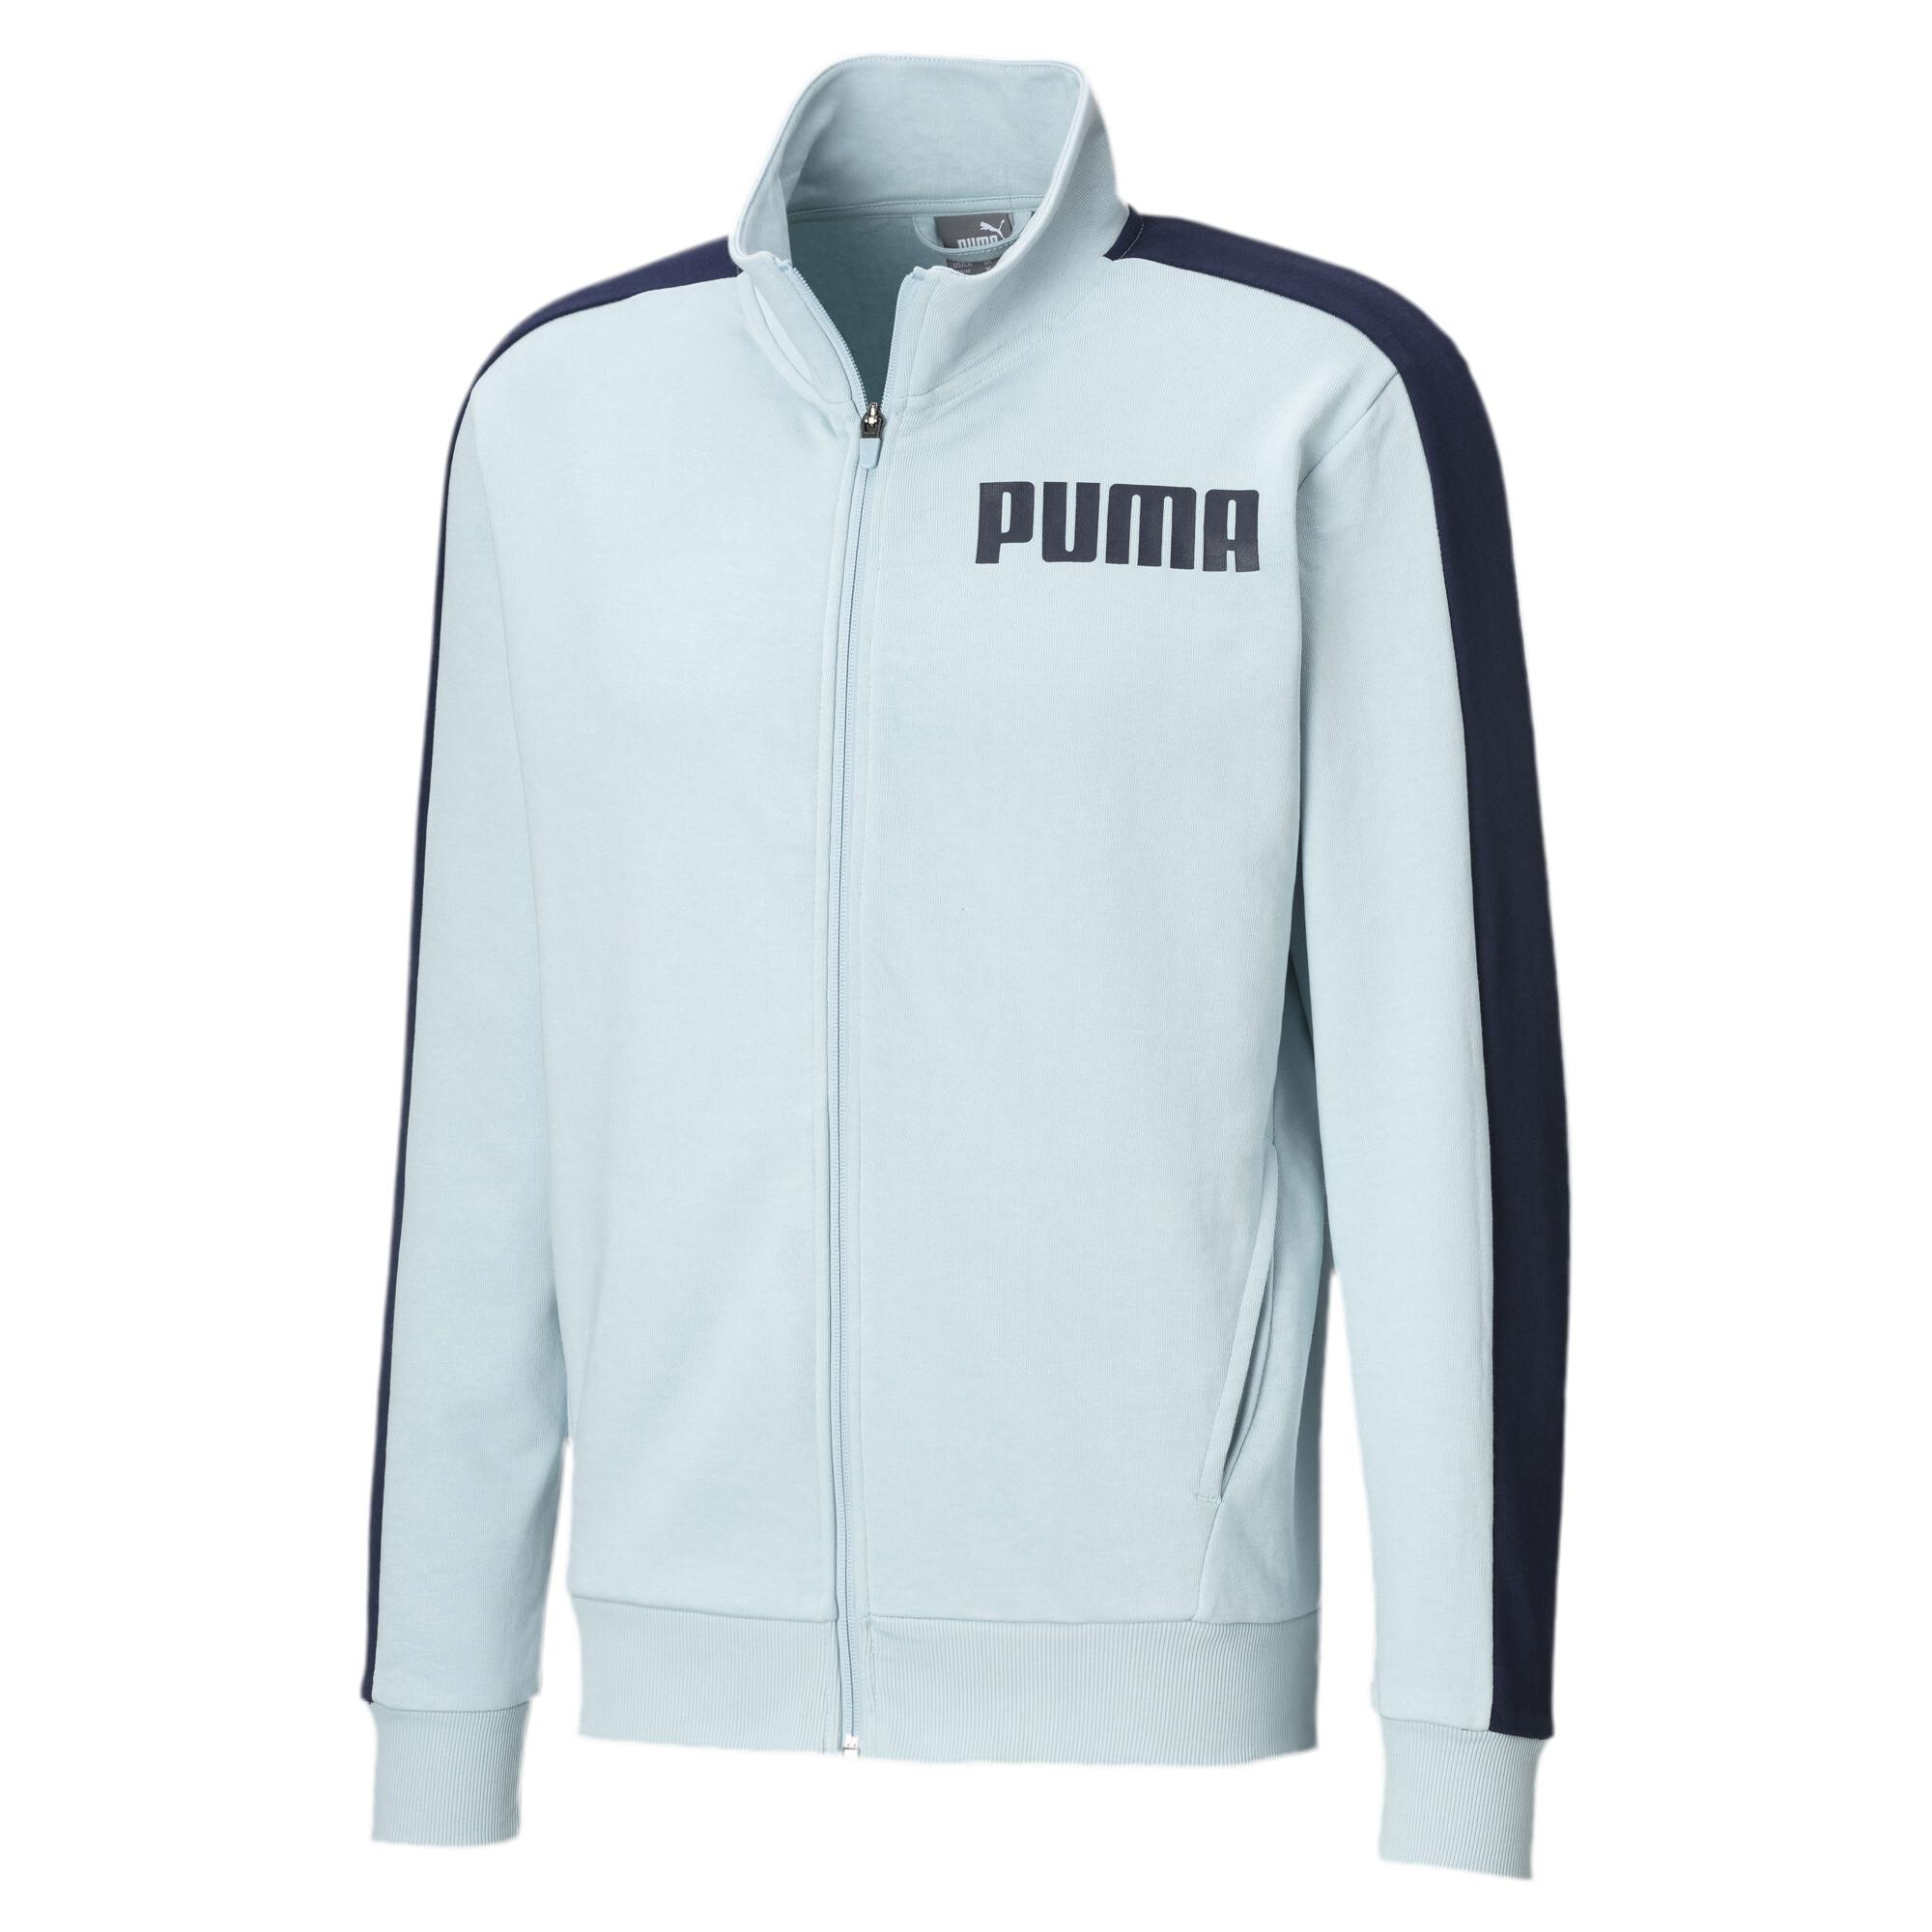 Details zu PUMA Contrast Herren Trainingsjacke Männer Sweat Basics Neu